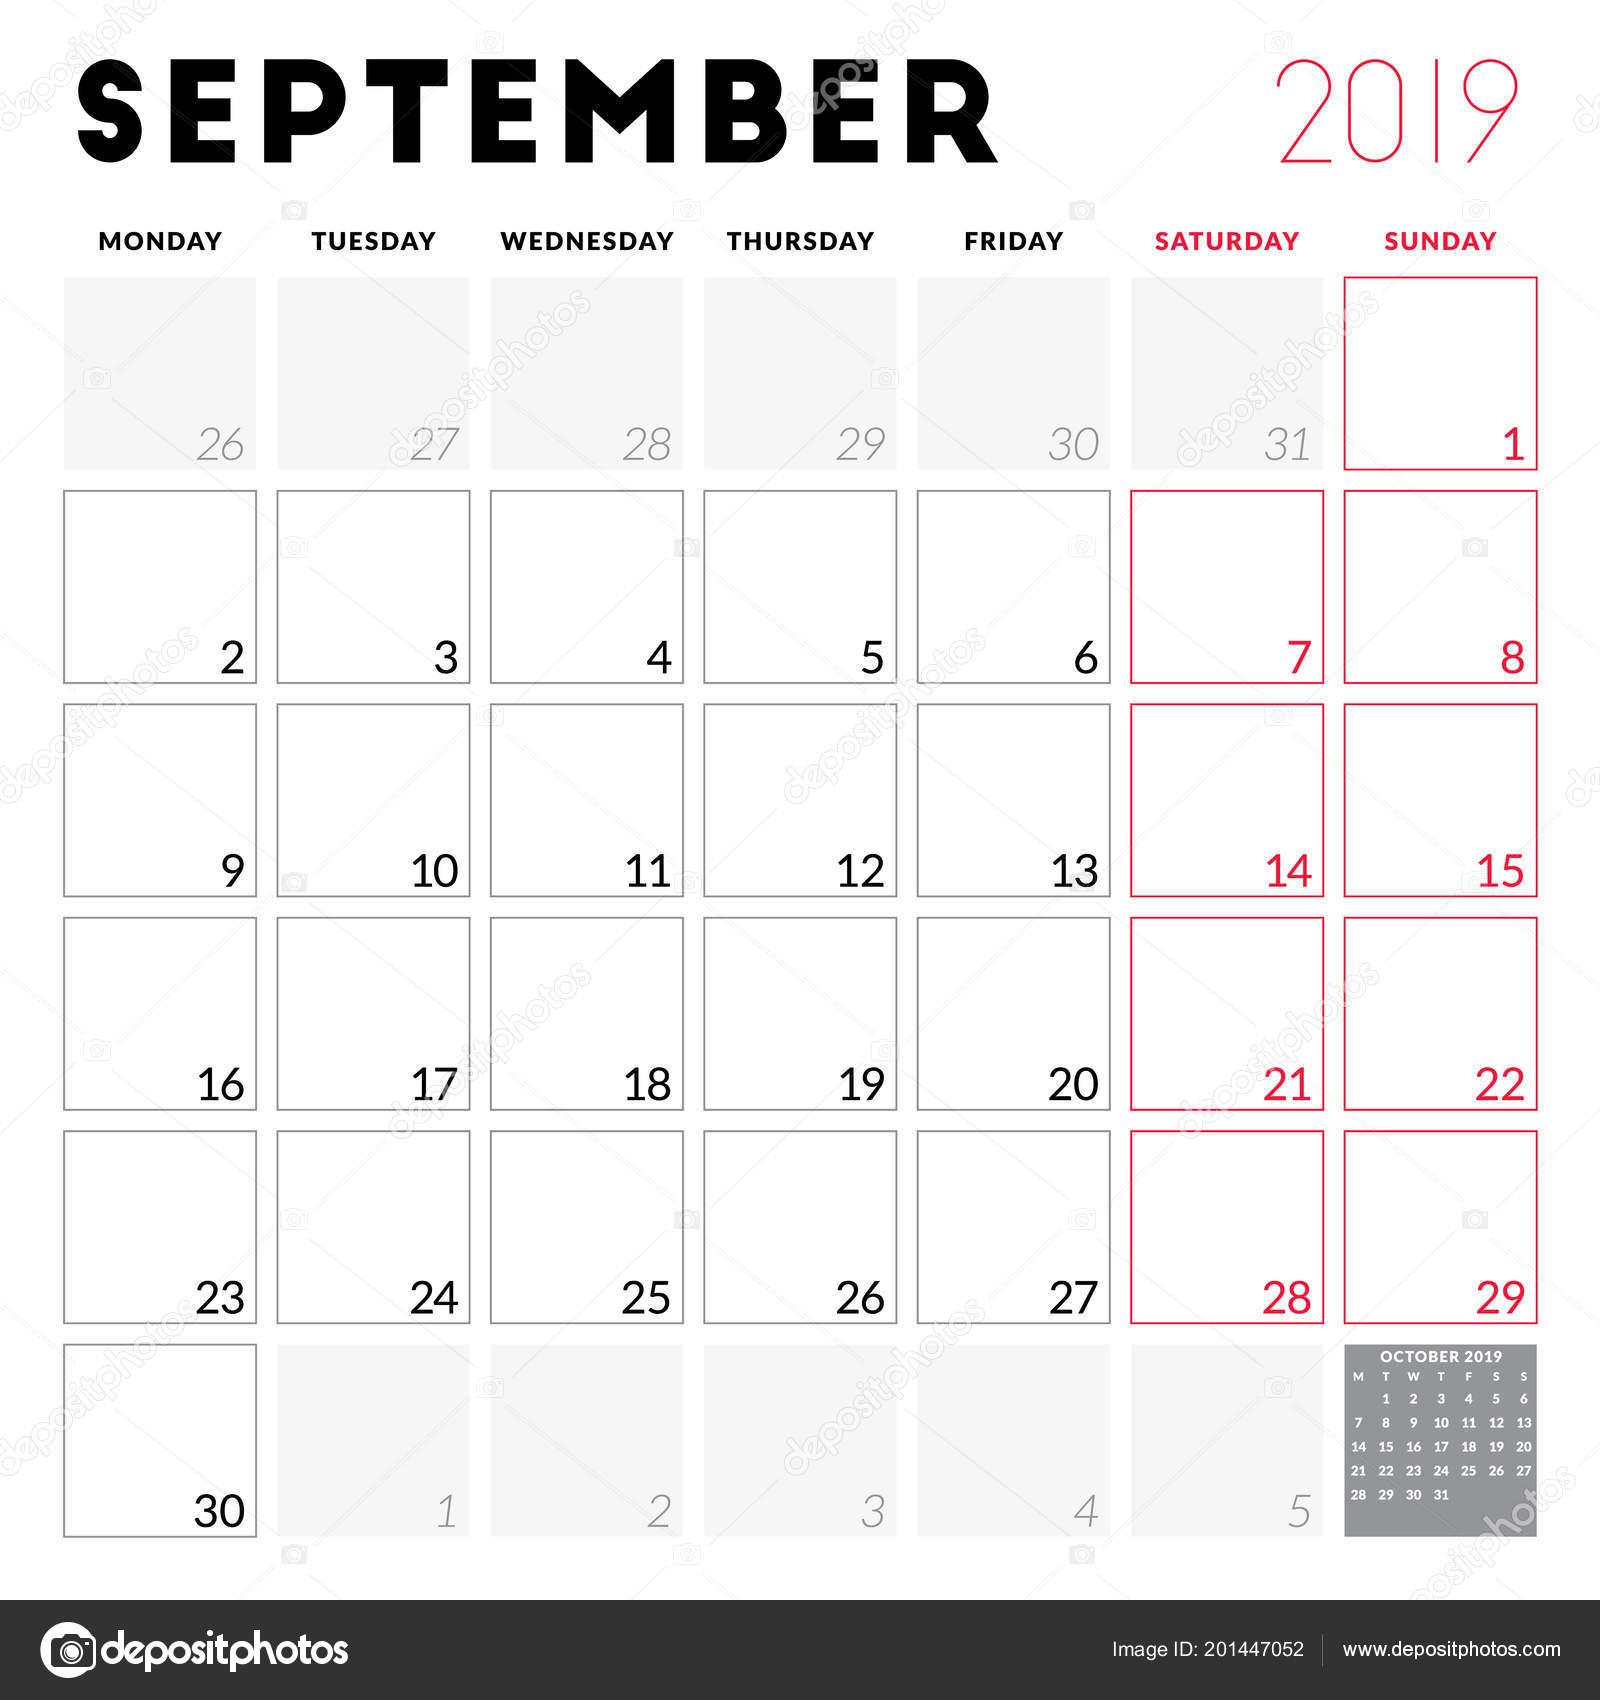 Calendar Planner September 2019 Week Starts Monday Printable